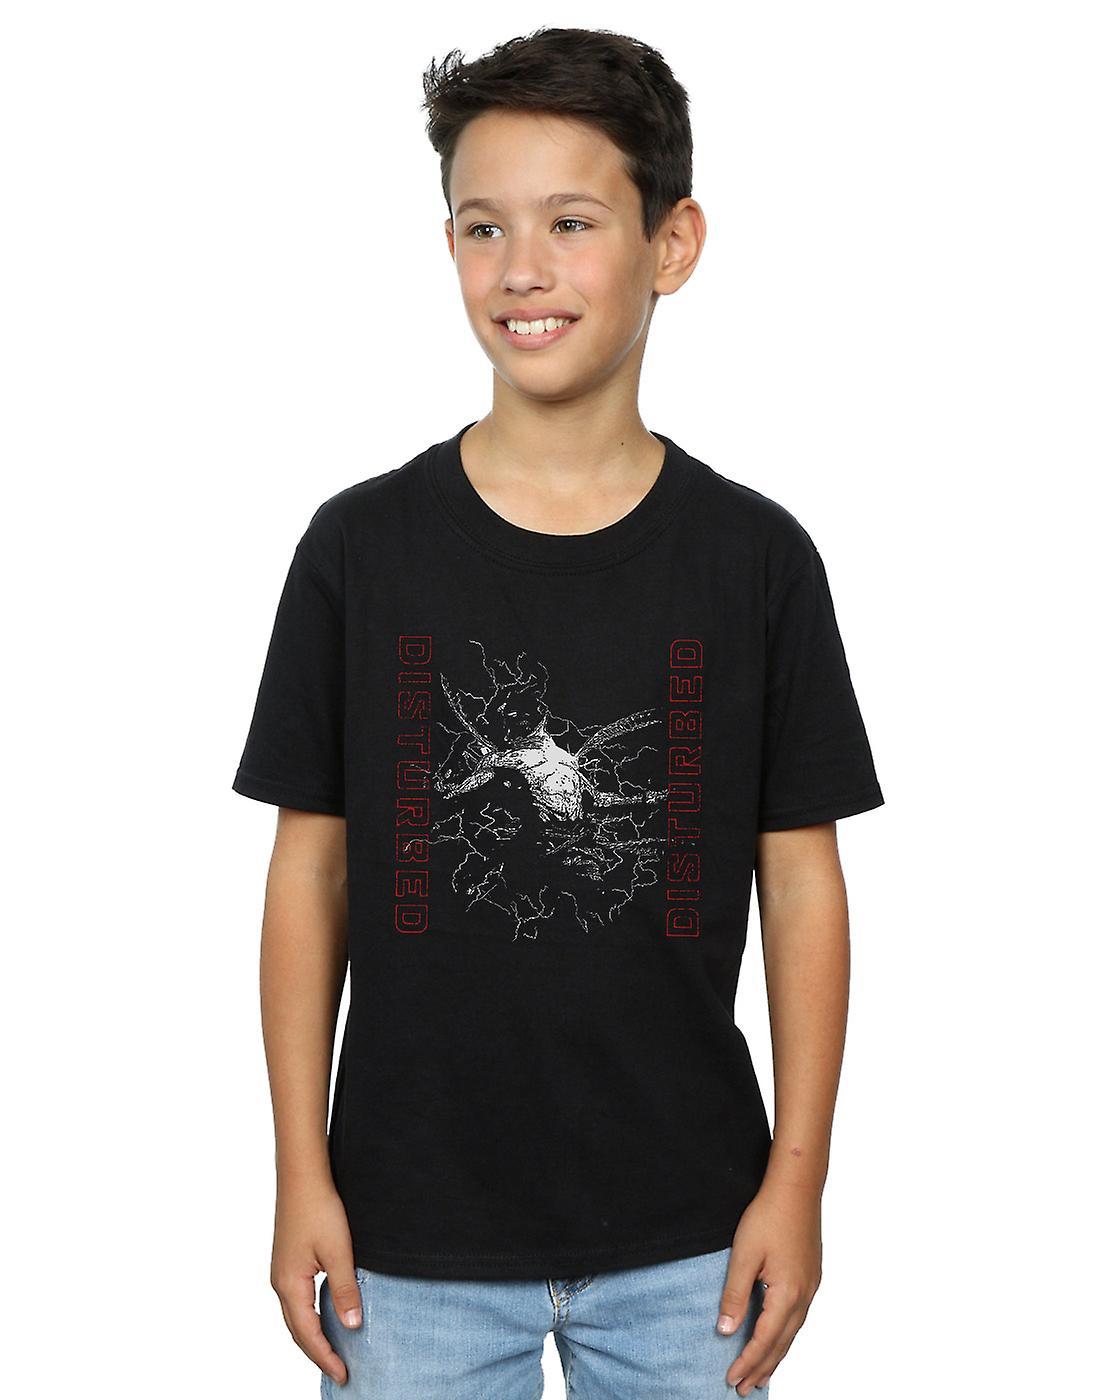 Disturbed Boys Evolution Sketch T-Shirt